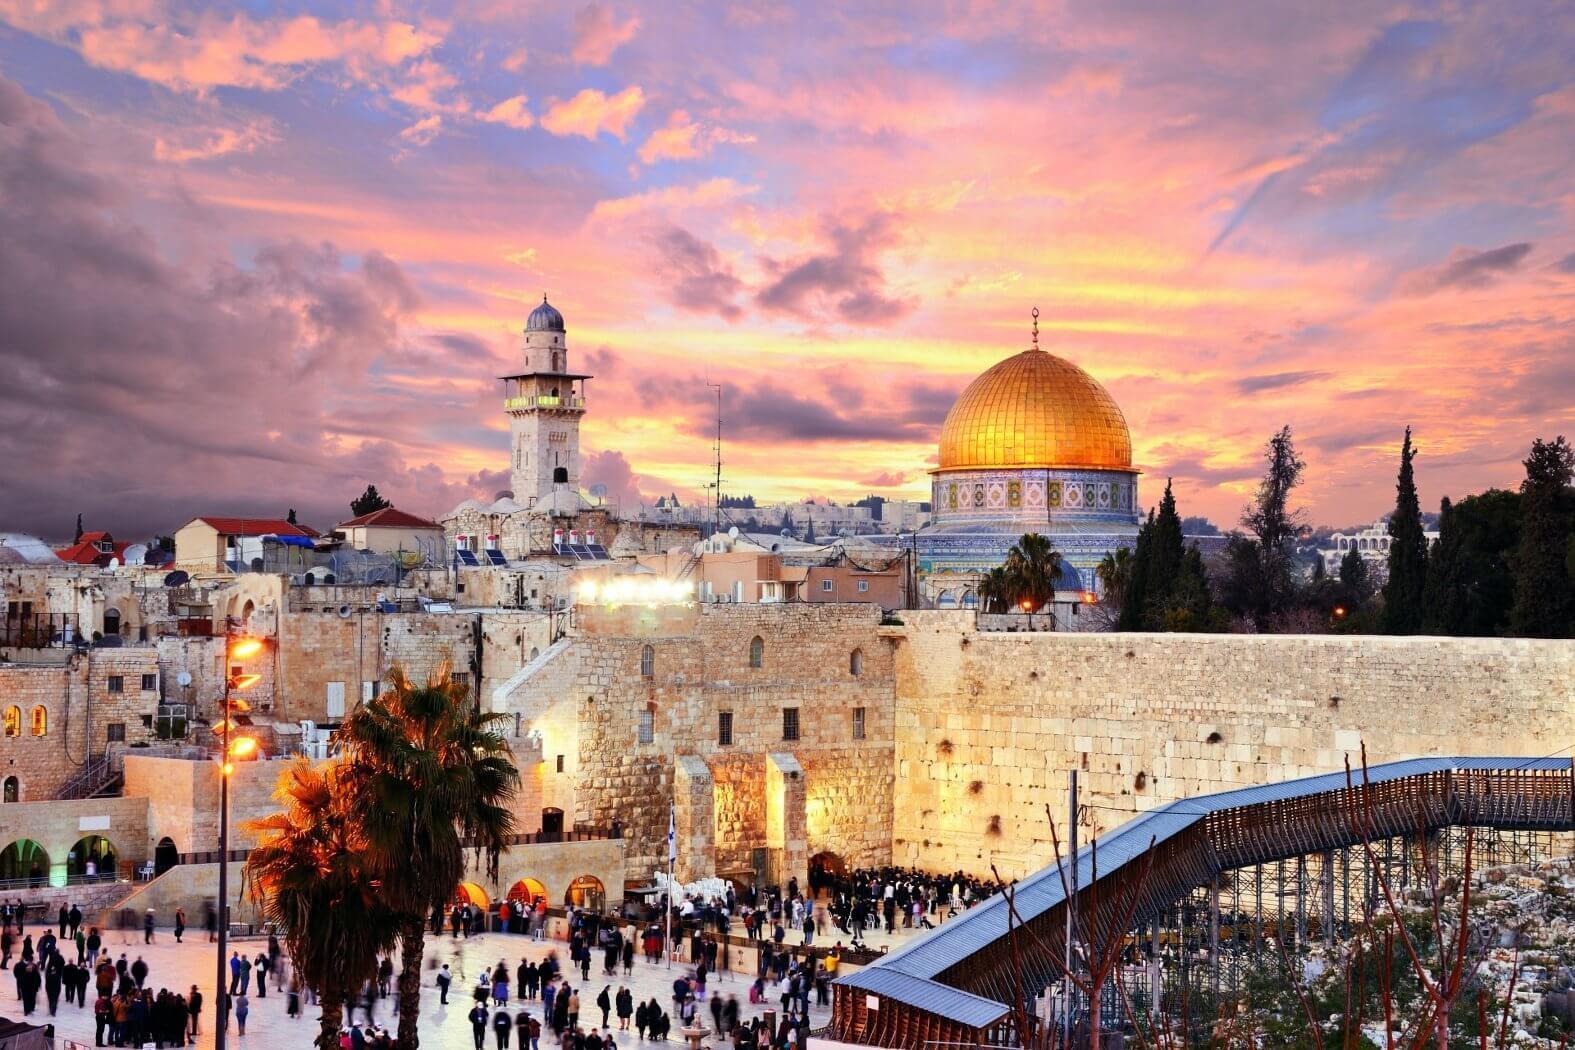 Ürdün - Kudüs - İsrail Turu